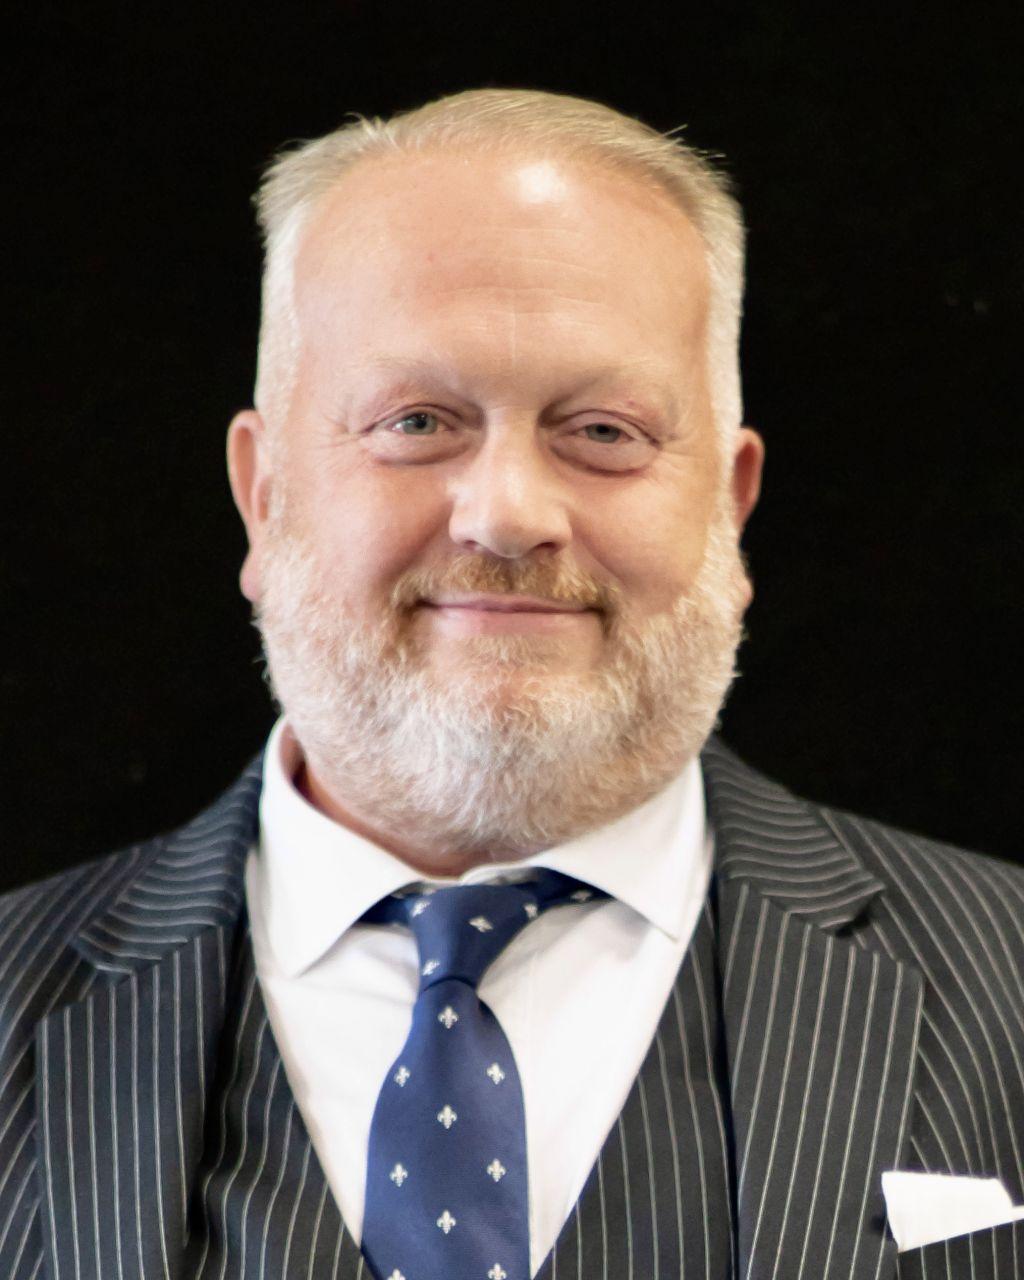 Maidstone Borough Council's new Leader